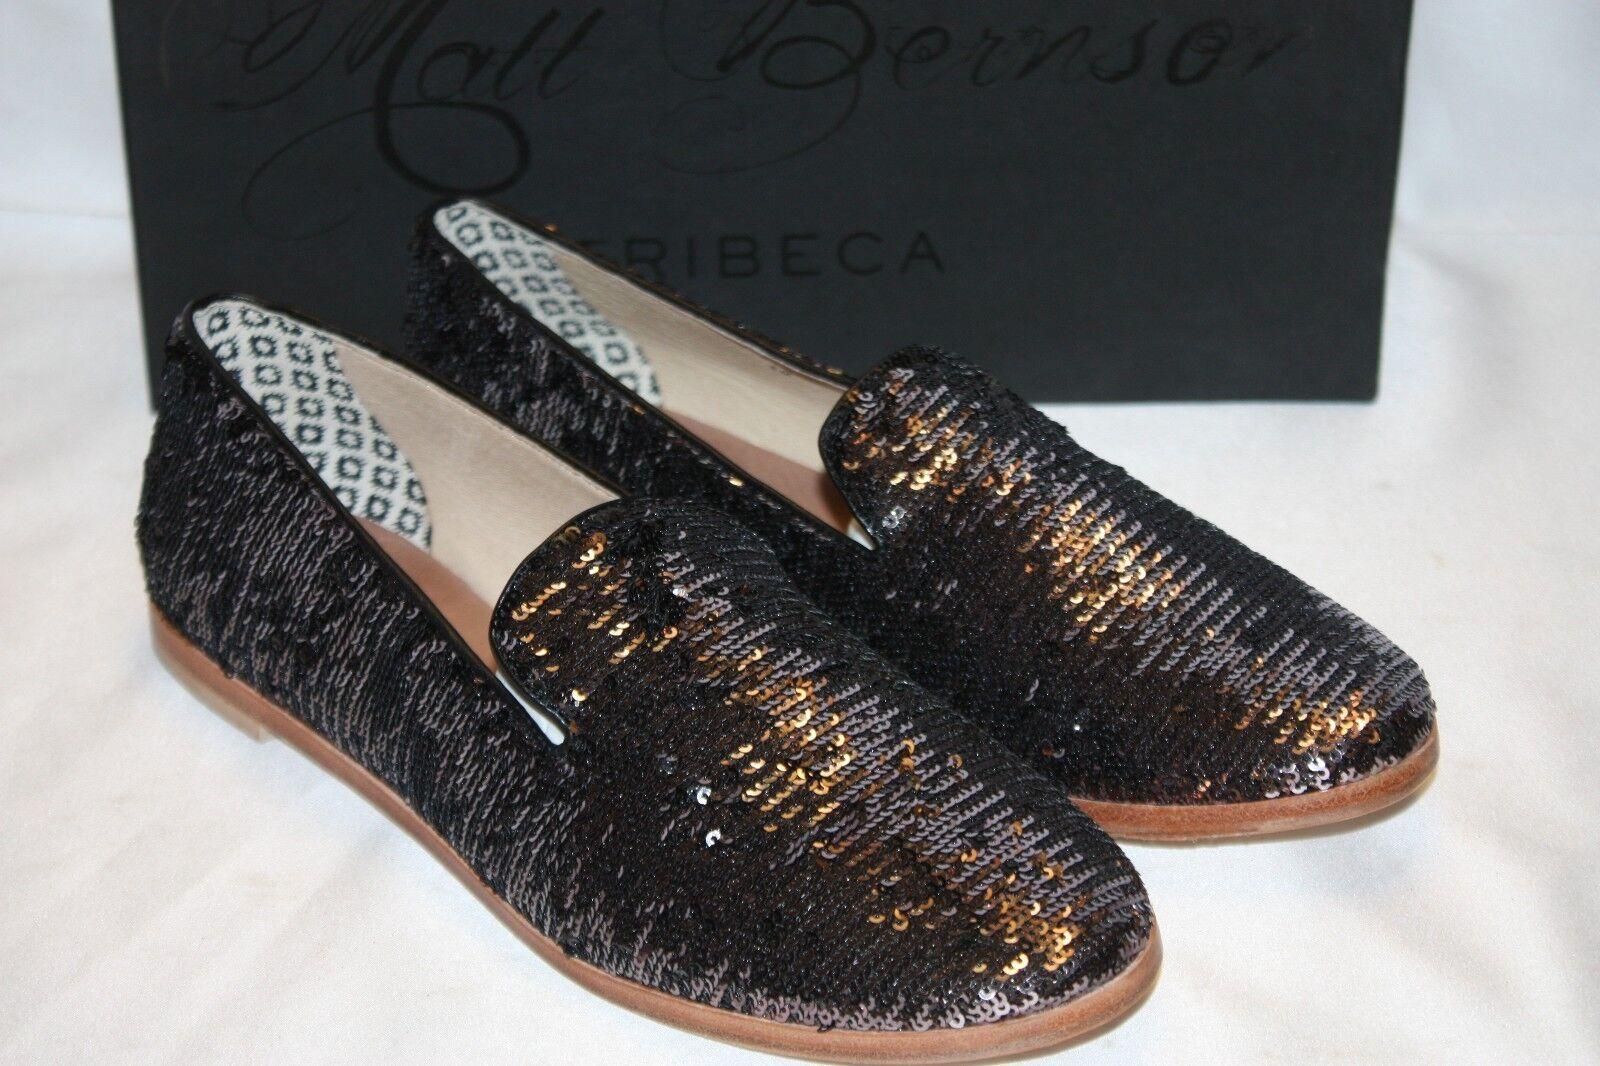 NEW  NIB  MATT BERNSON Gunmetal Sequin GITANES Smoking shoes Loafers 8 9.5  168